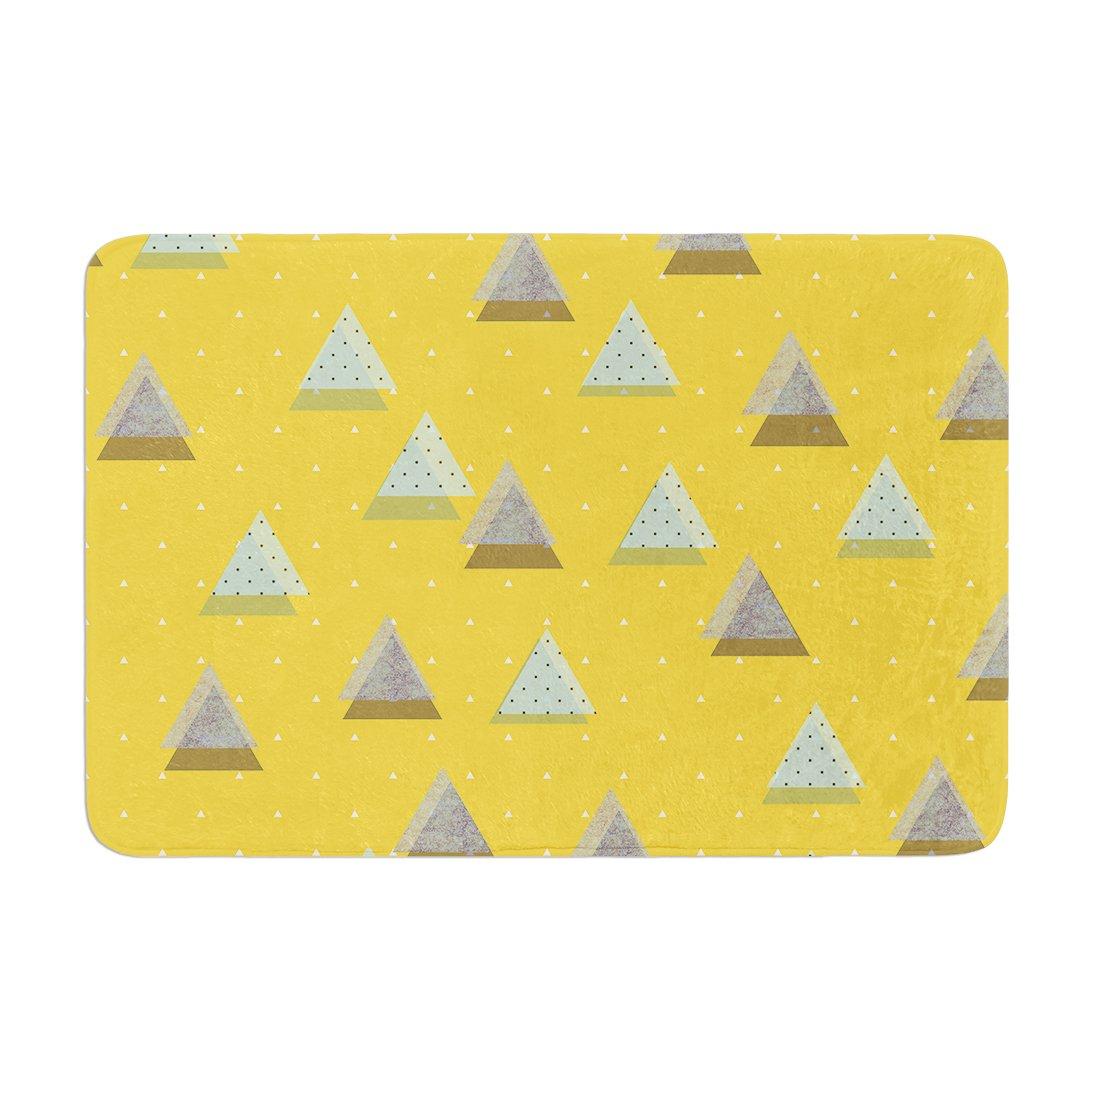 17 by 24 Kess InHouse Strawberringo Triangles Yellow Geometric Memory Foam Bath Mat